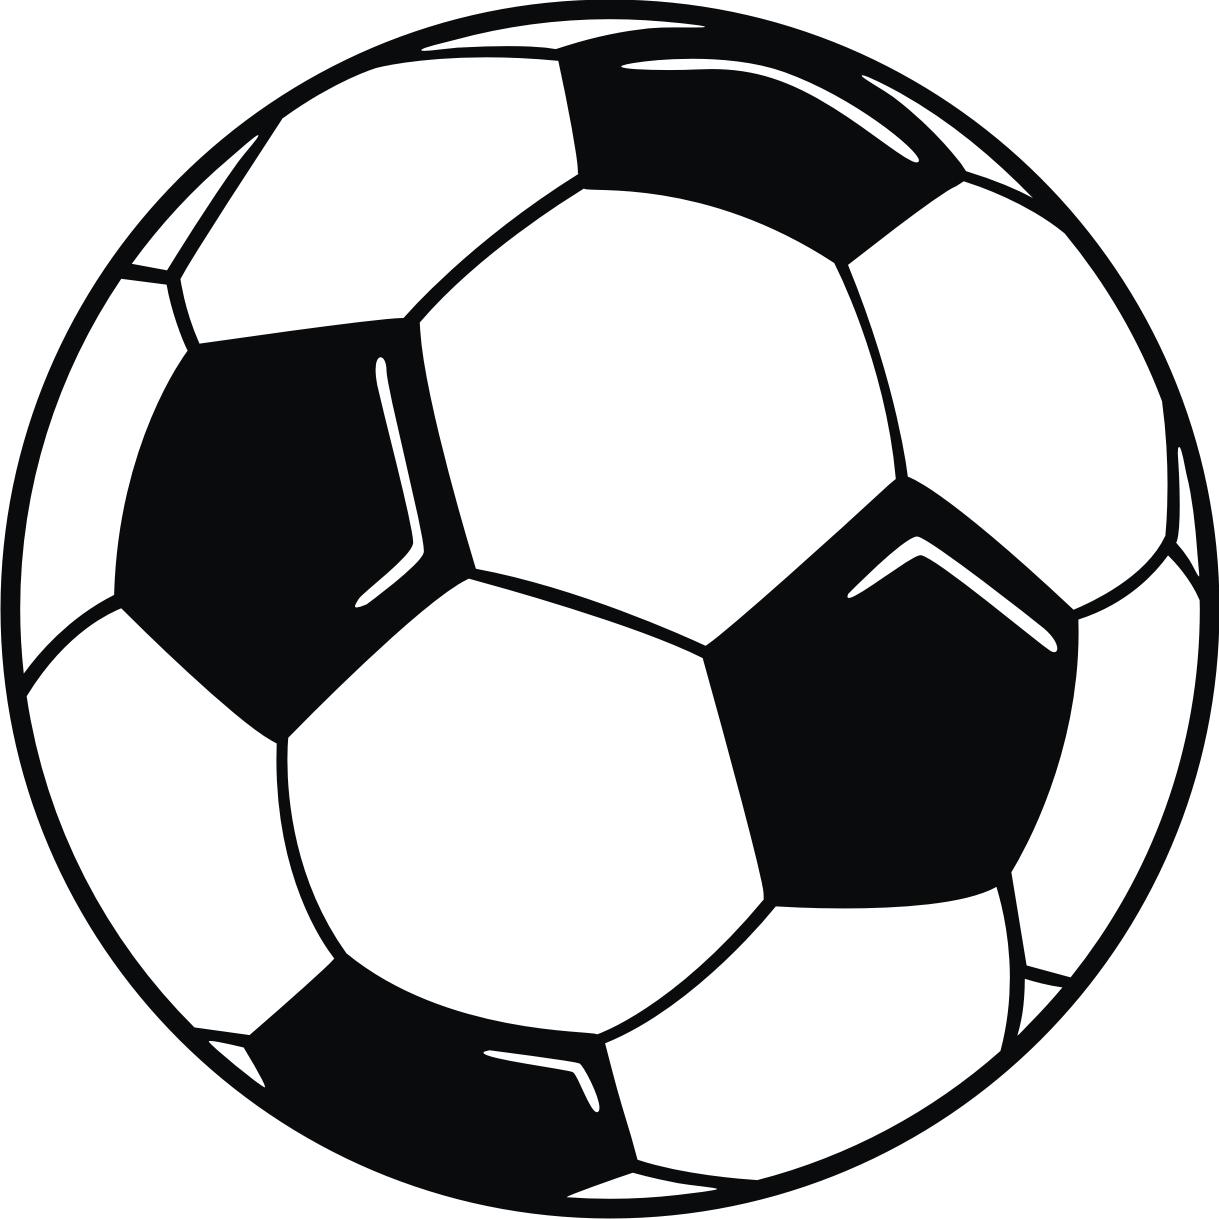 1219x1219 Soccer Logos Clipart